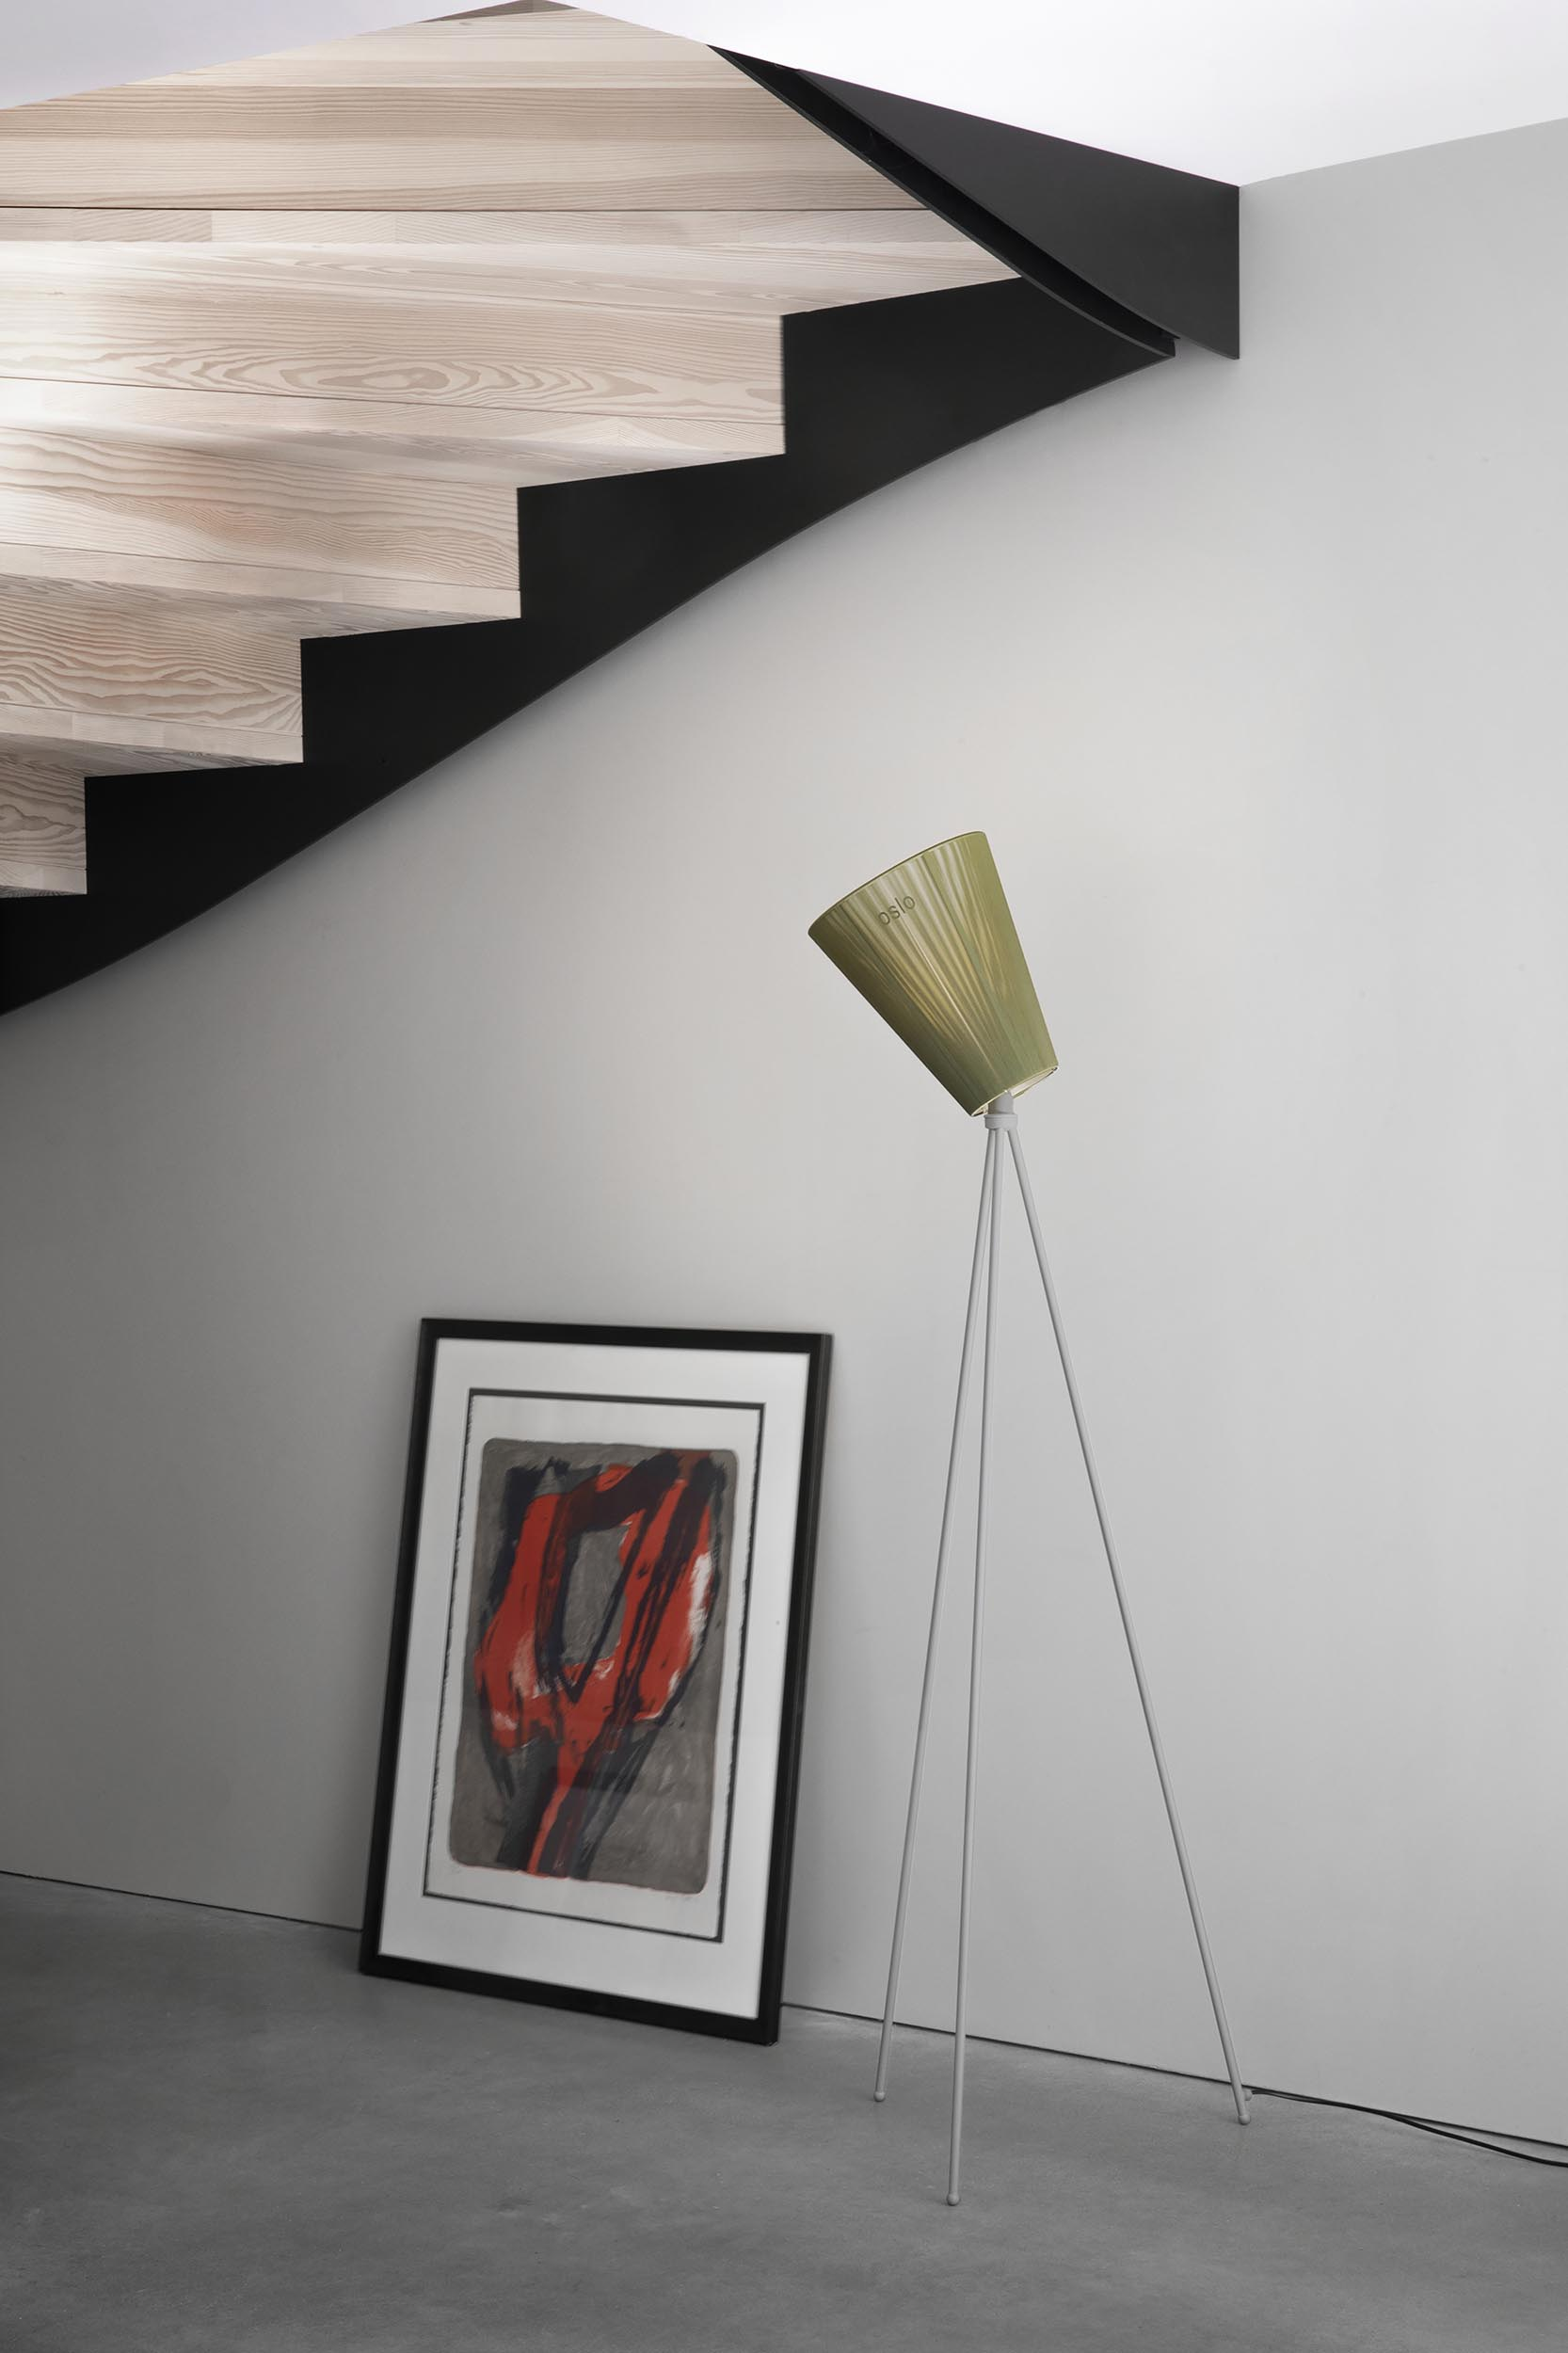 Oslo_Wood_lamp_light-grey_olive-green_hallway_Northern